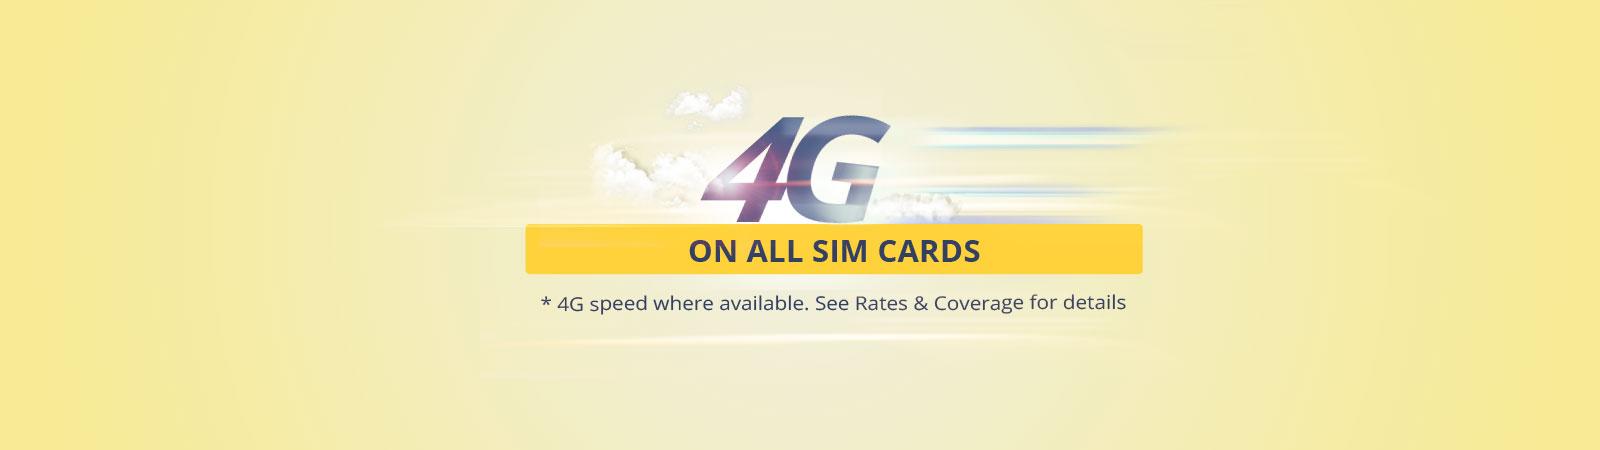 International SIM Card | Prepaid Roaming SIM from OneSimCard